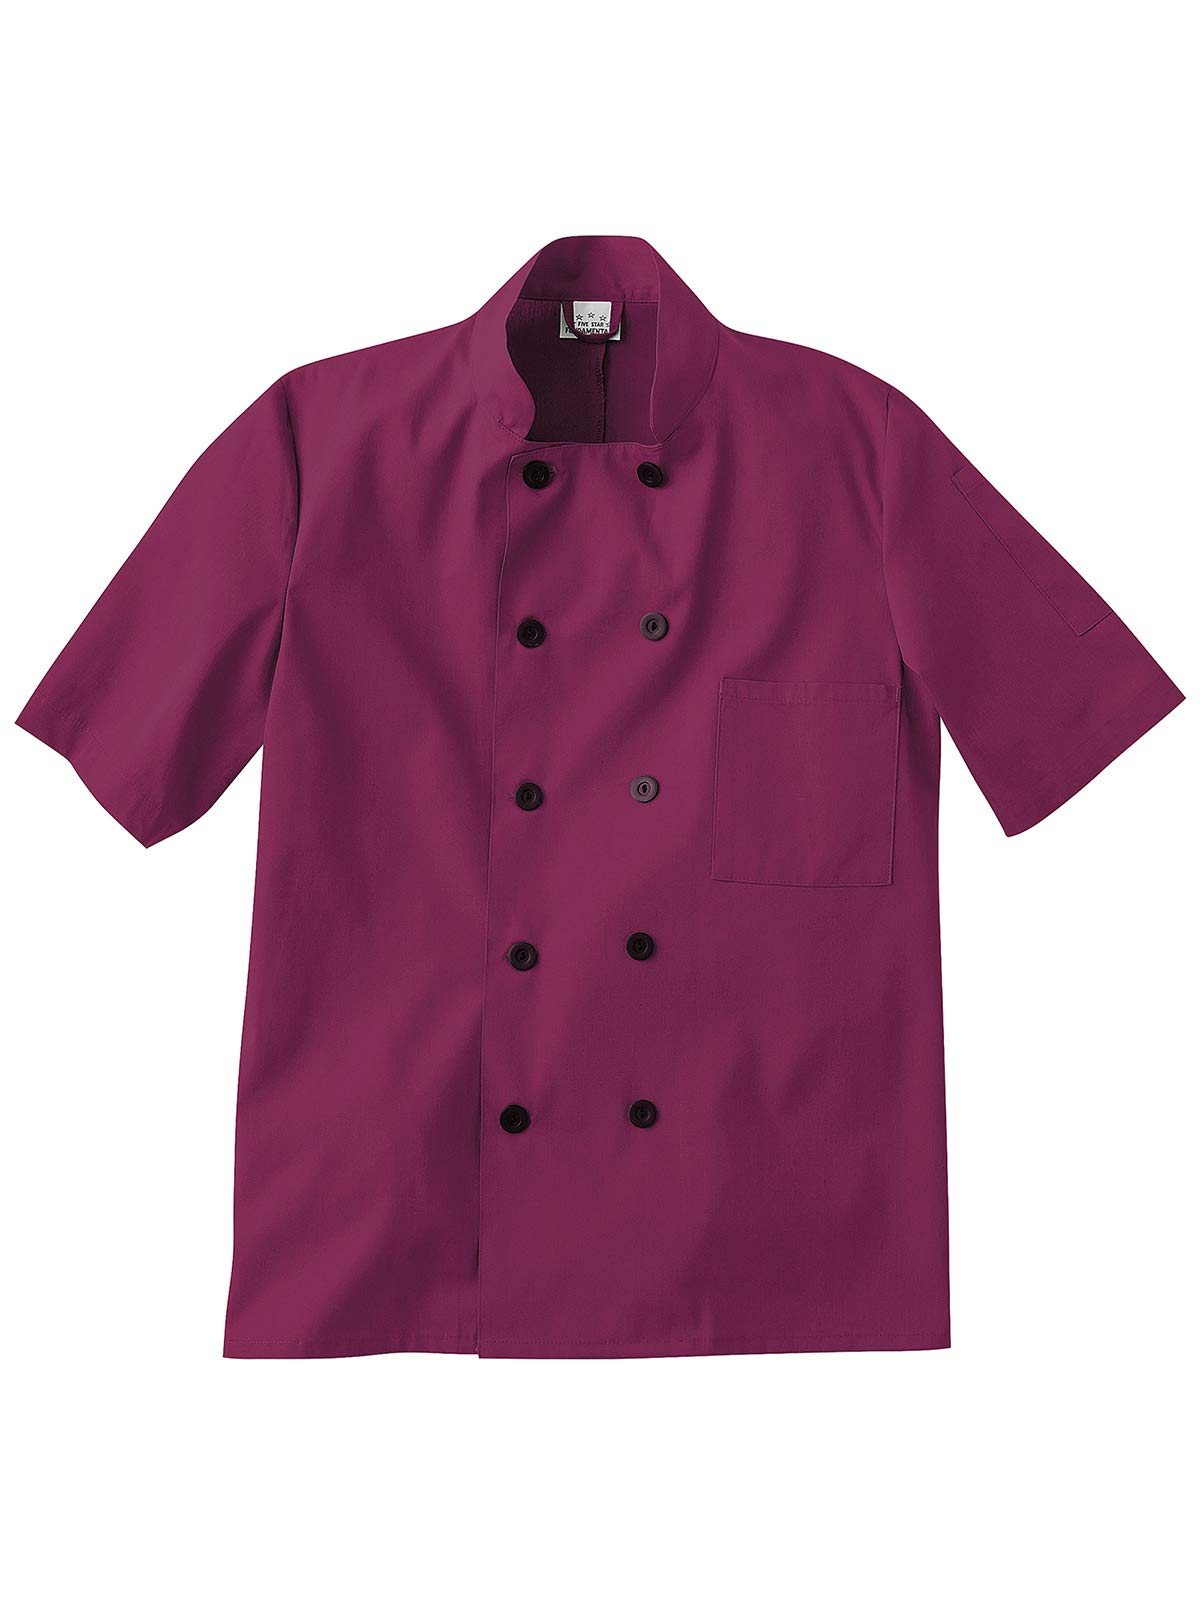 Five Star 18001/18025 Unisex Short Sleeve Chef Coat Wine 5XL